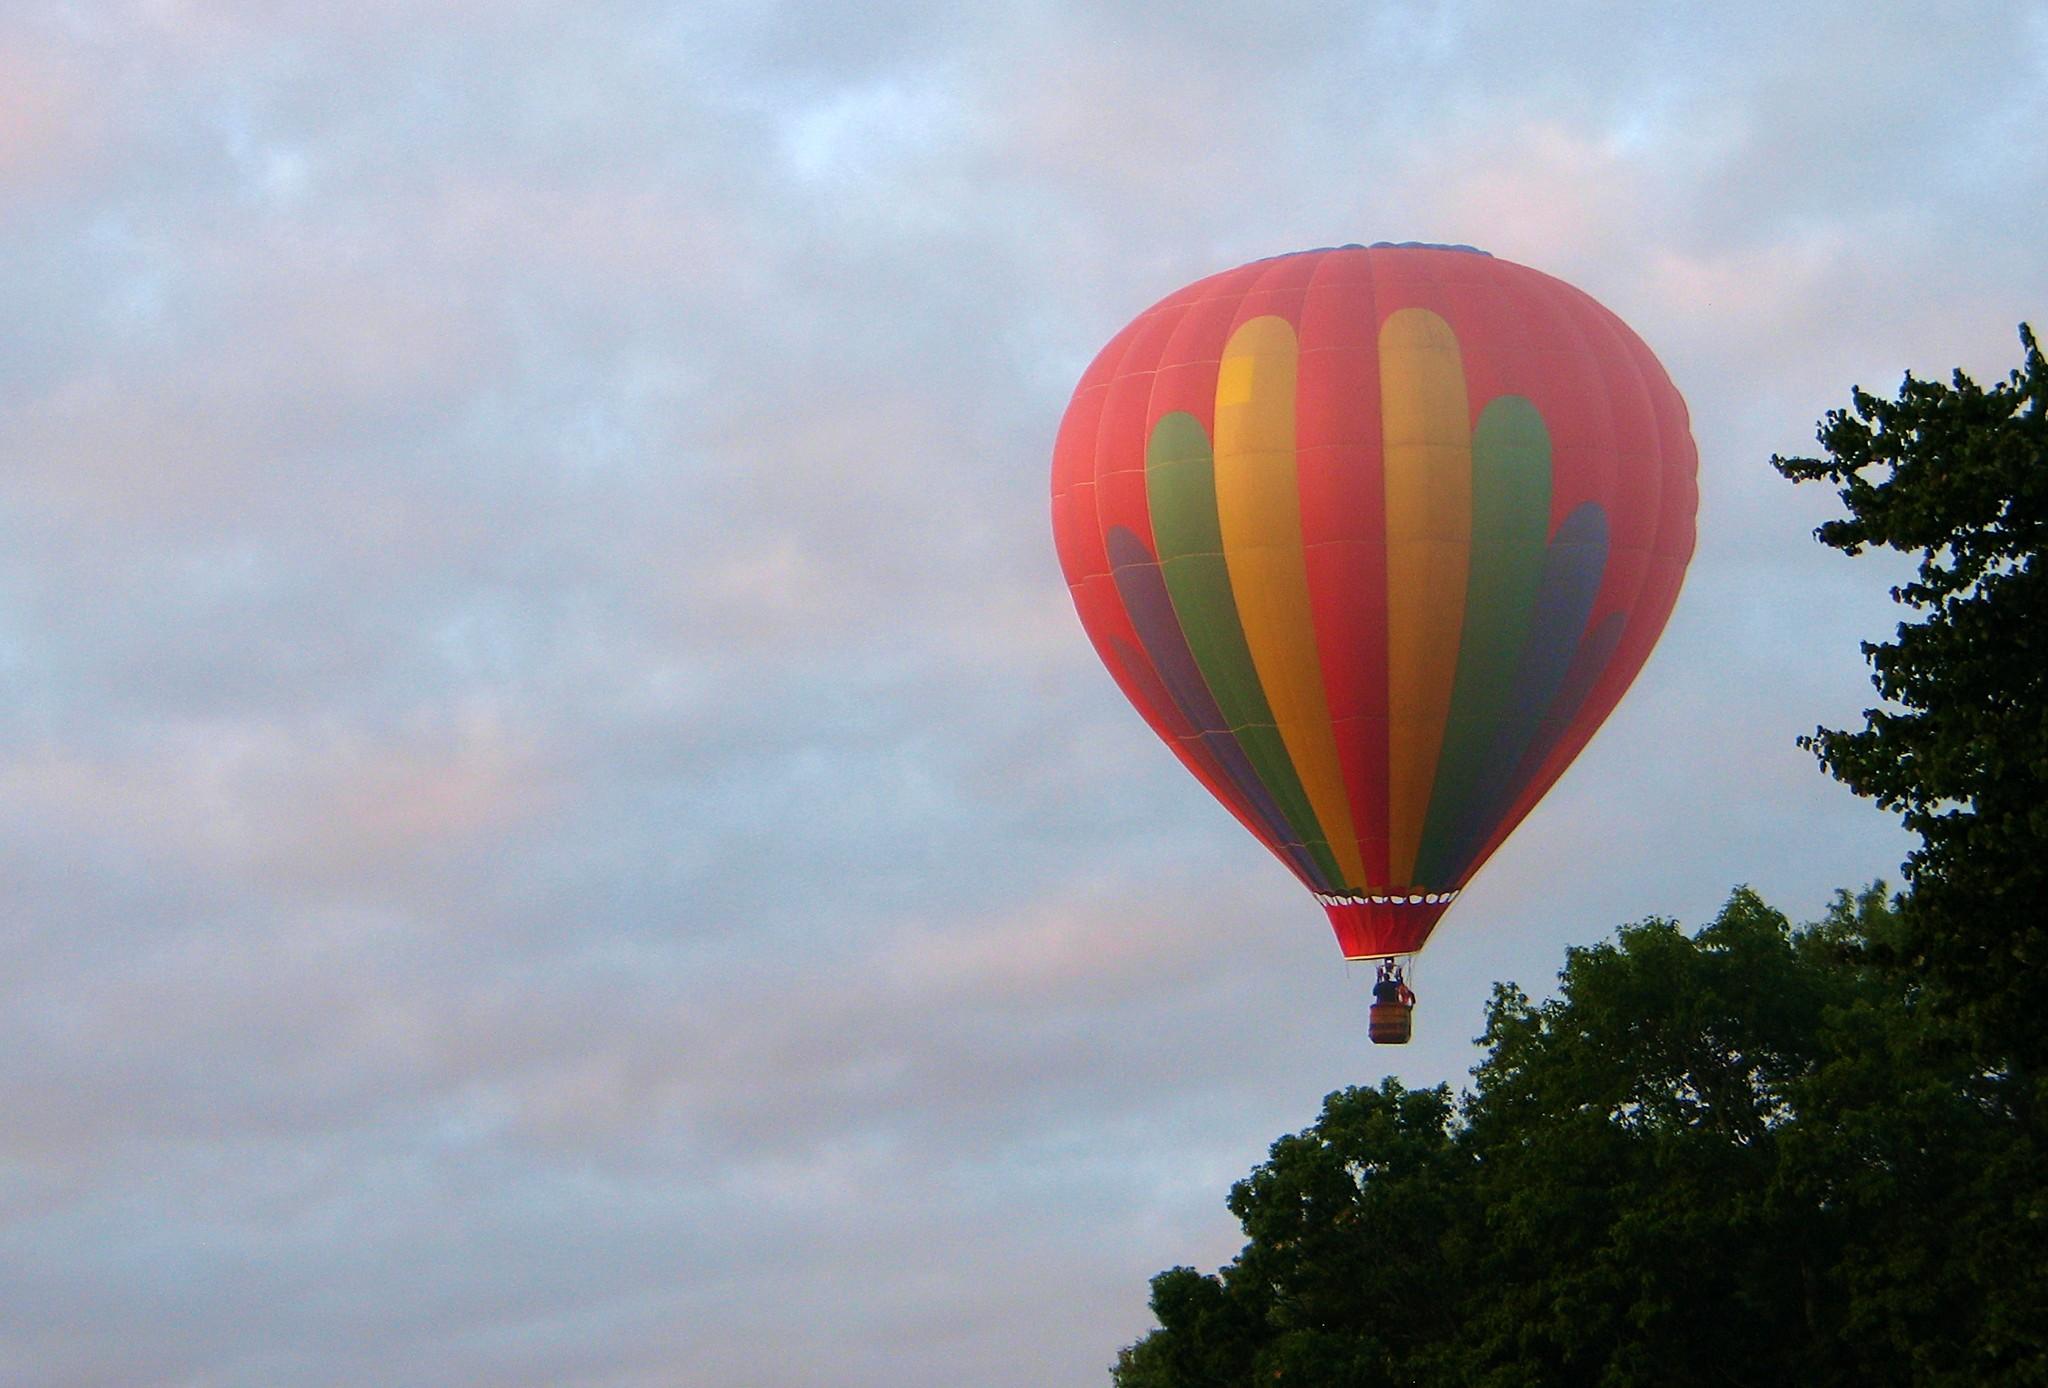 Hot Air Balloon – Heartlover1717, Flickr